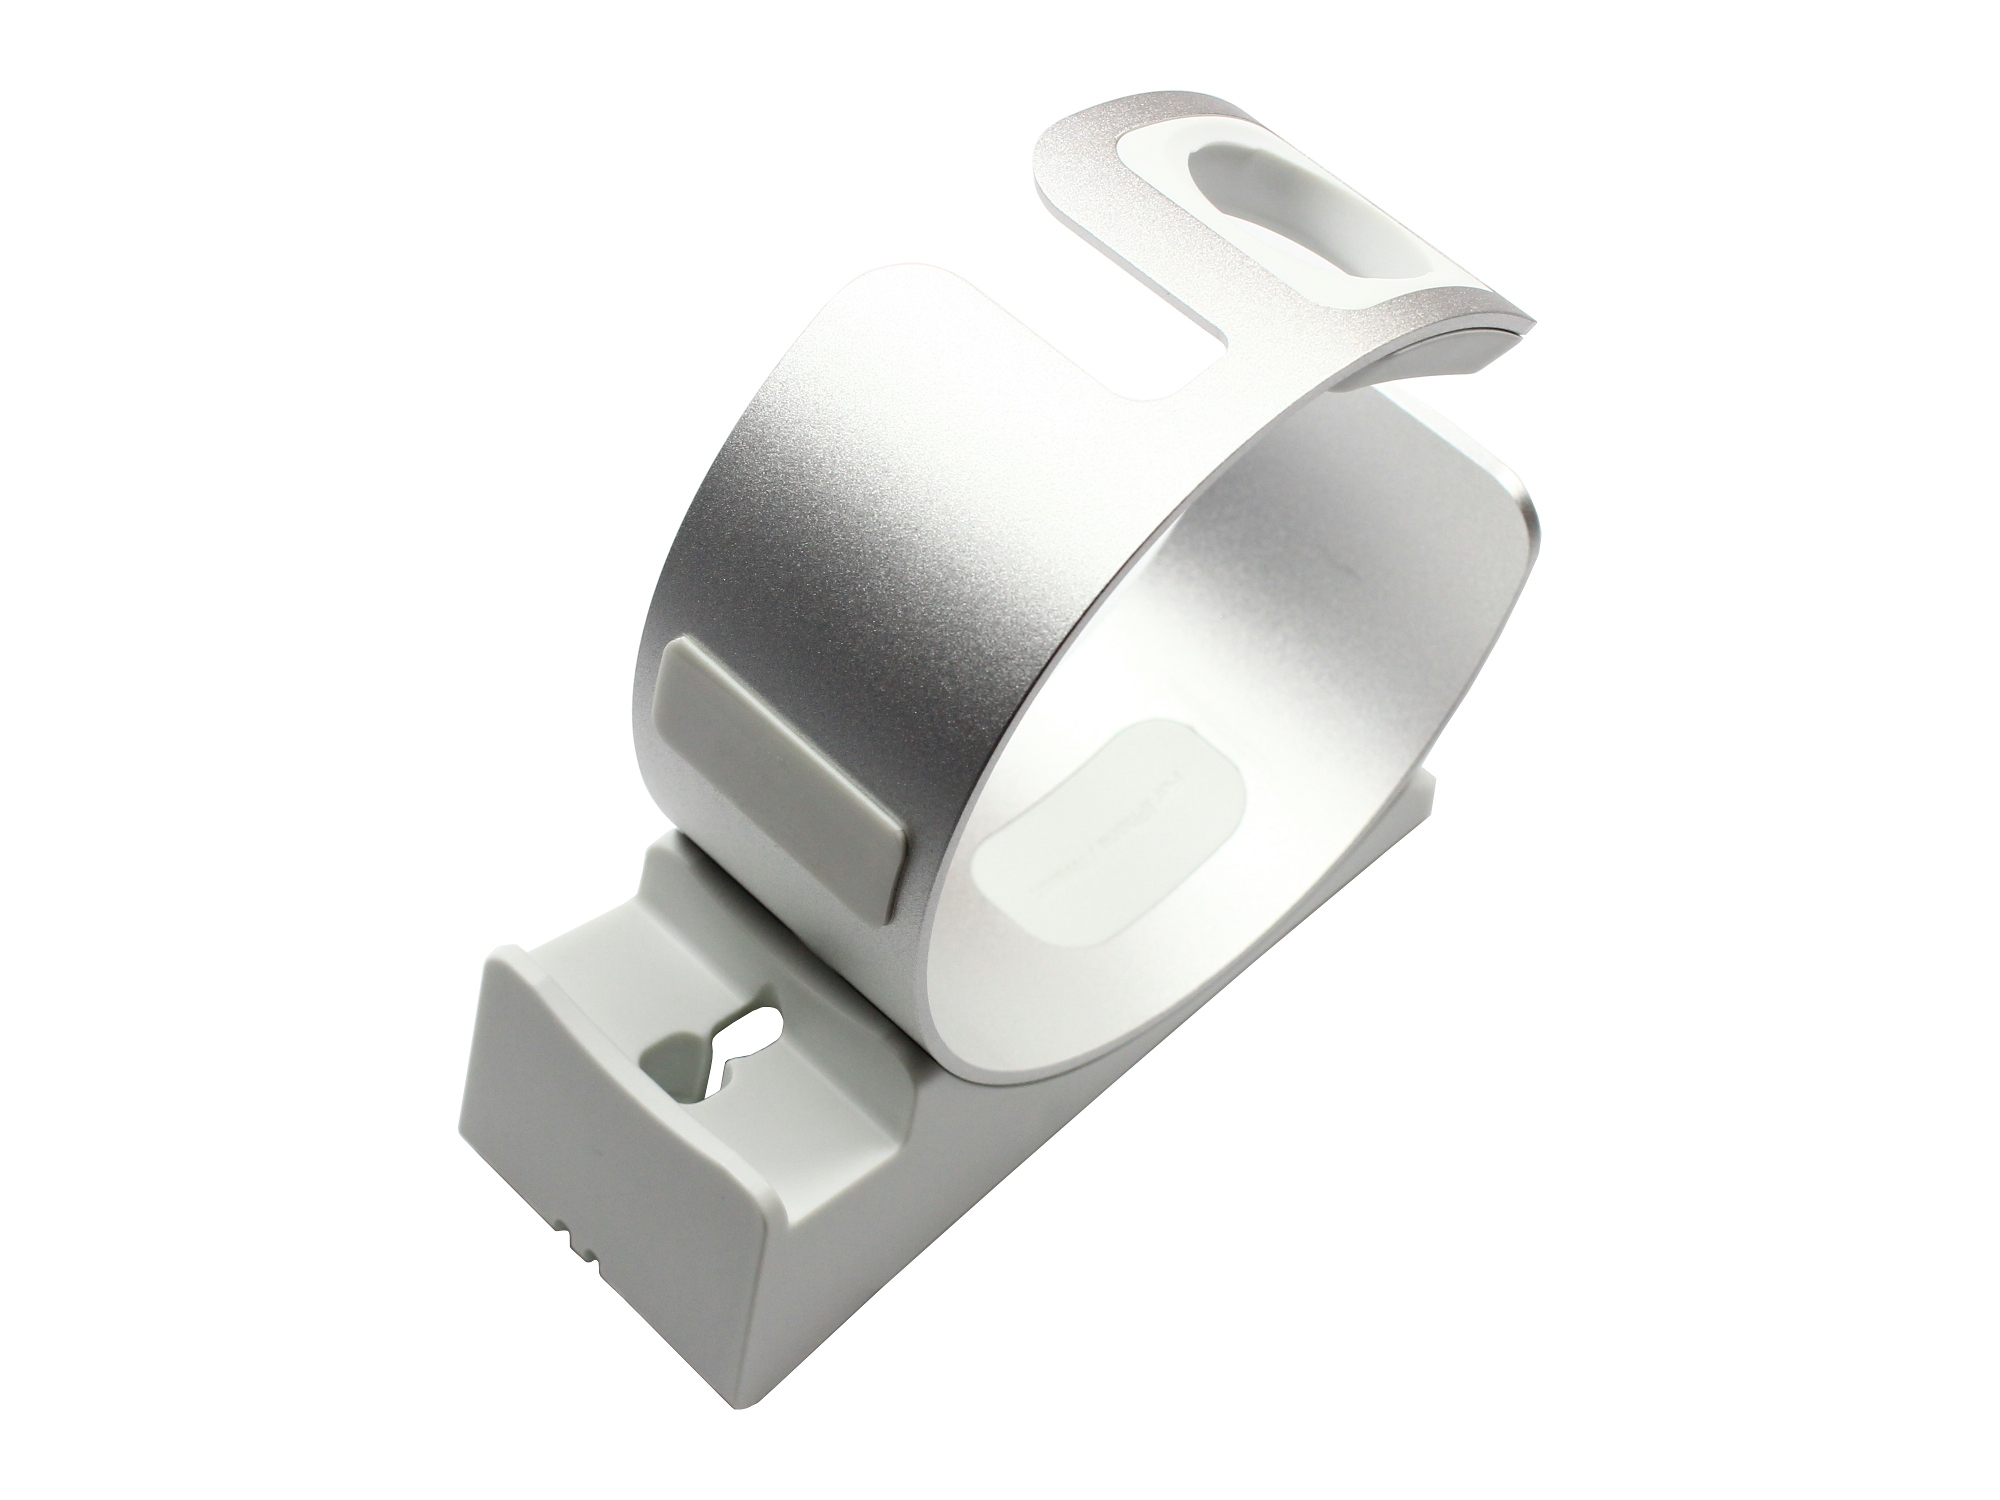 Stand de incarcare 2 in 1 pentru Apple Watch series 4, 3, 2, 1, iPhone XS, XS Max, XR, X, 8, 8 Plus, 7, 7 Plus, 6S, 6S Plus, 6, 6 Plus, SE, 5S, 5C, 5, aluminiu, argintiu